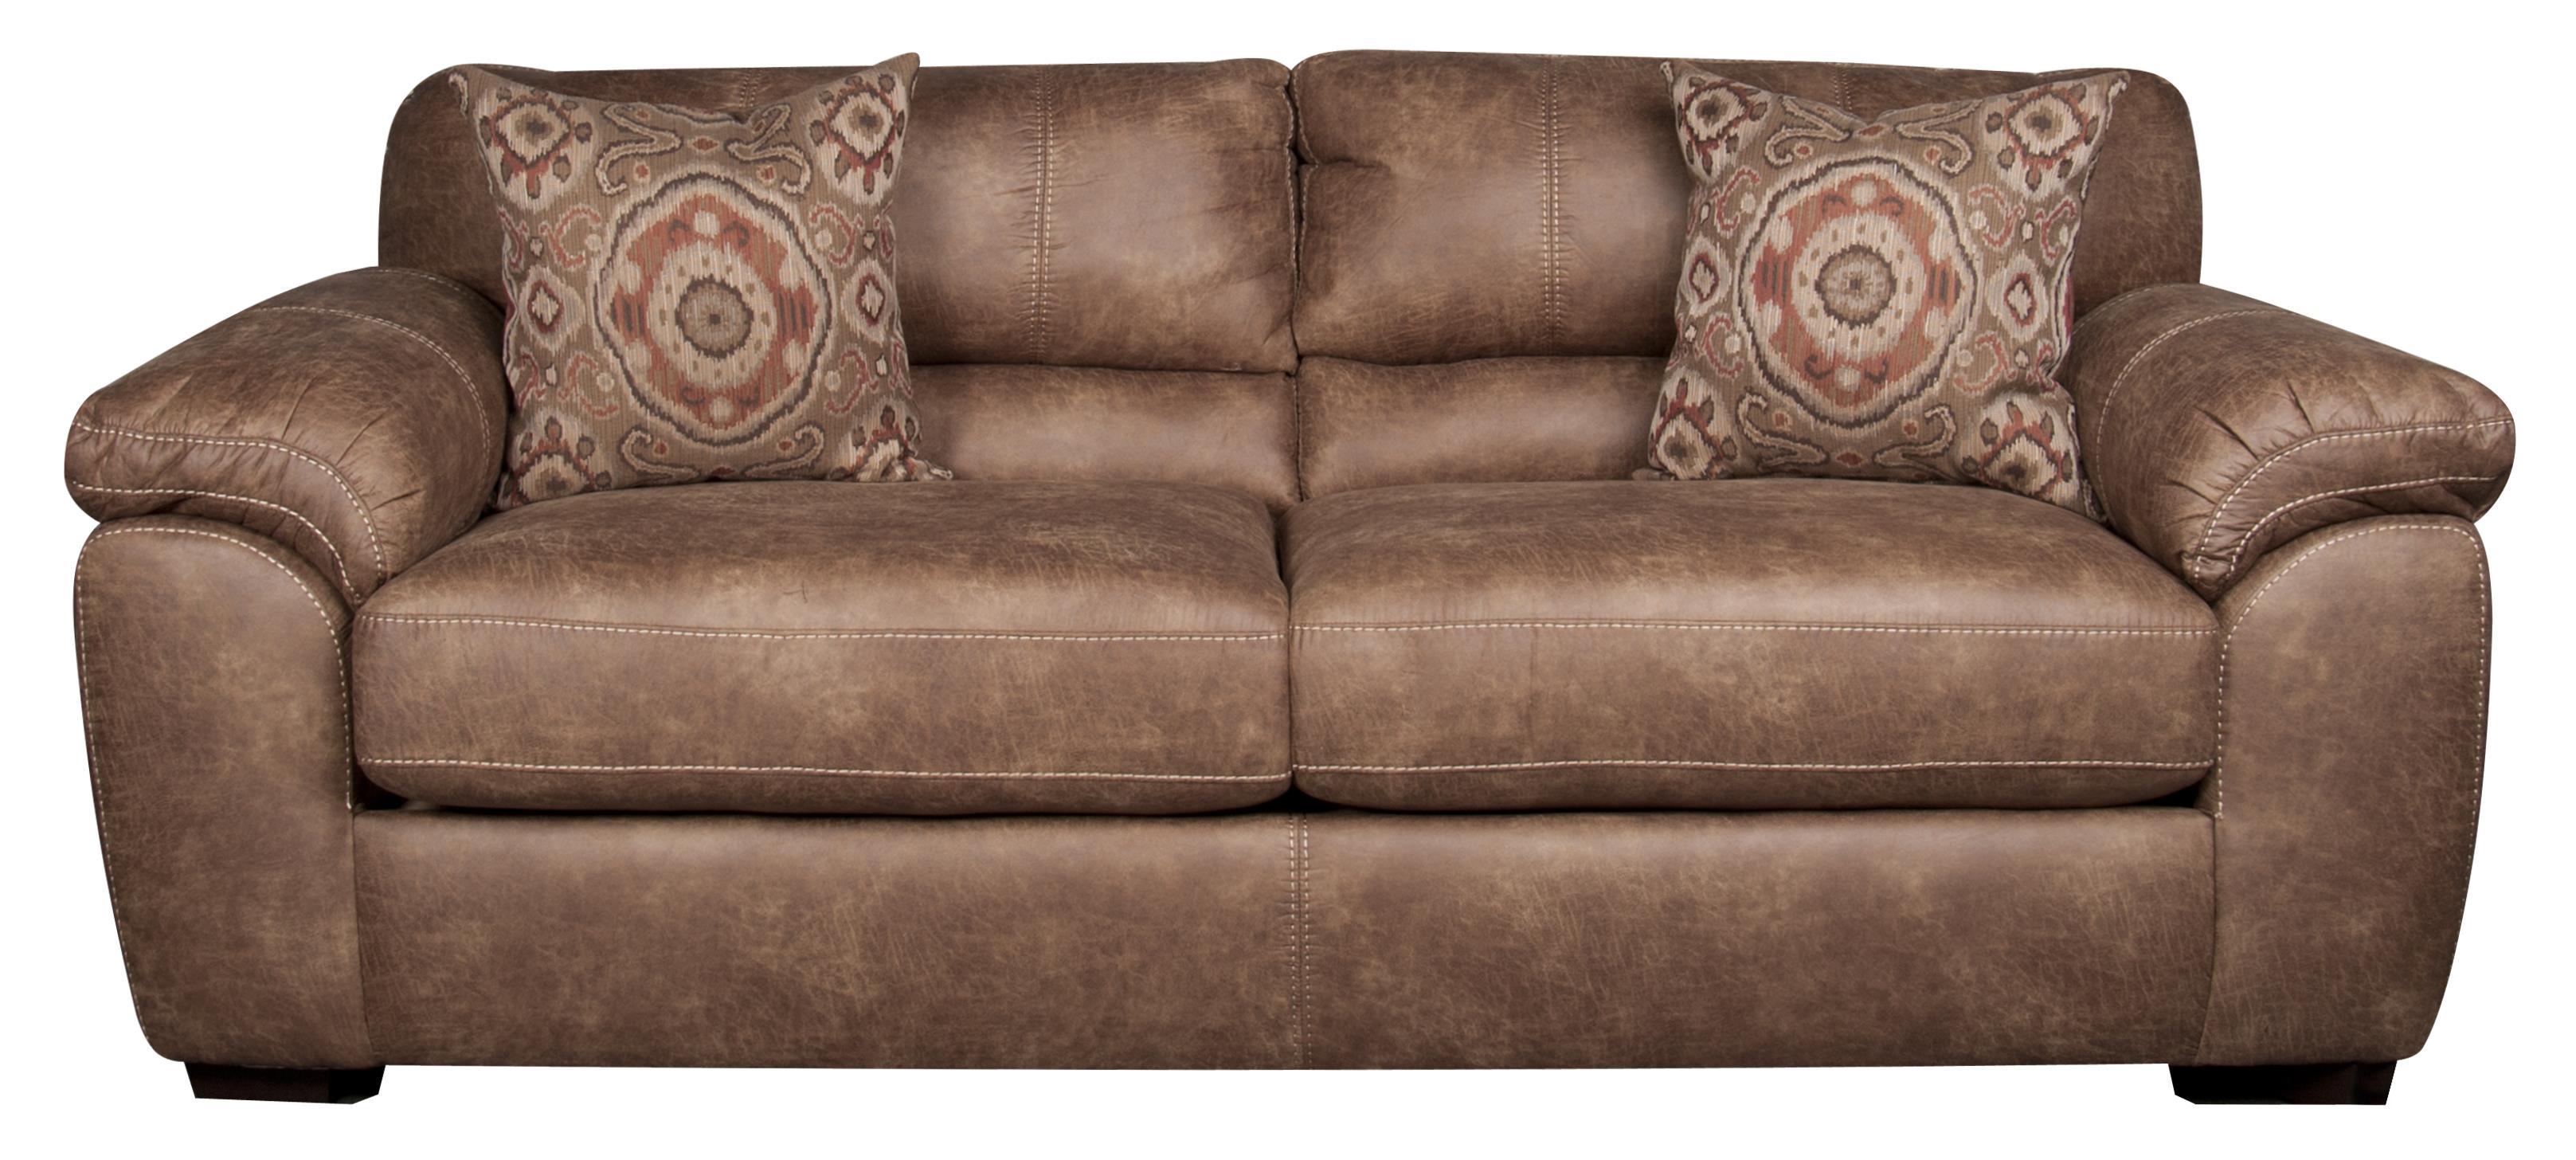 Morris Home Furnishings Shawn Shawn Sofa - Item Number: 642301036